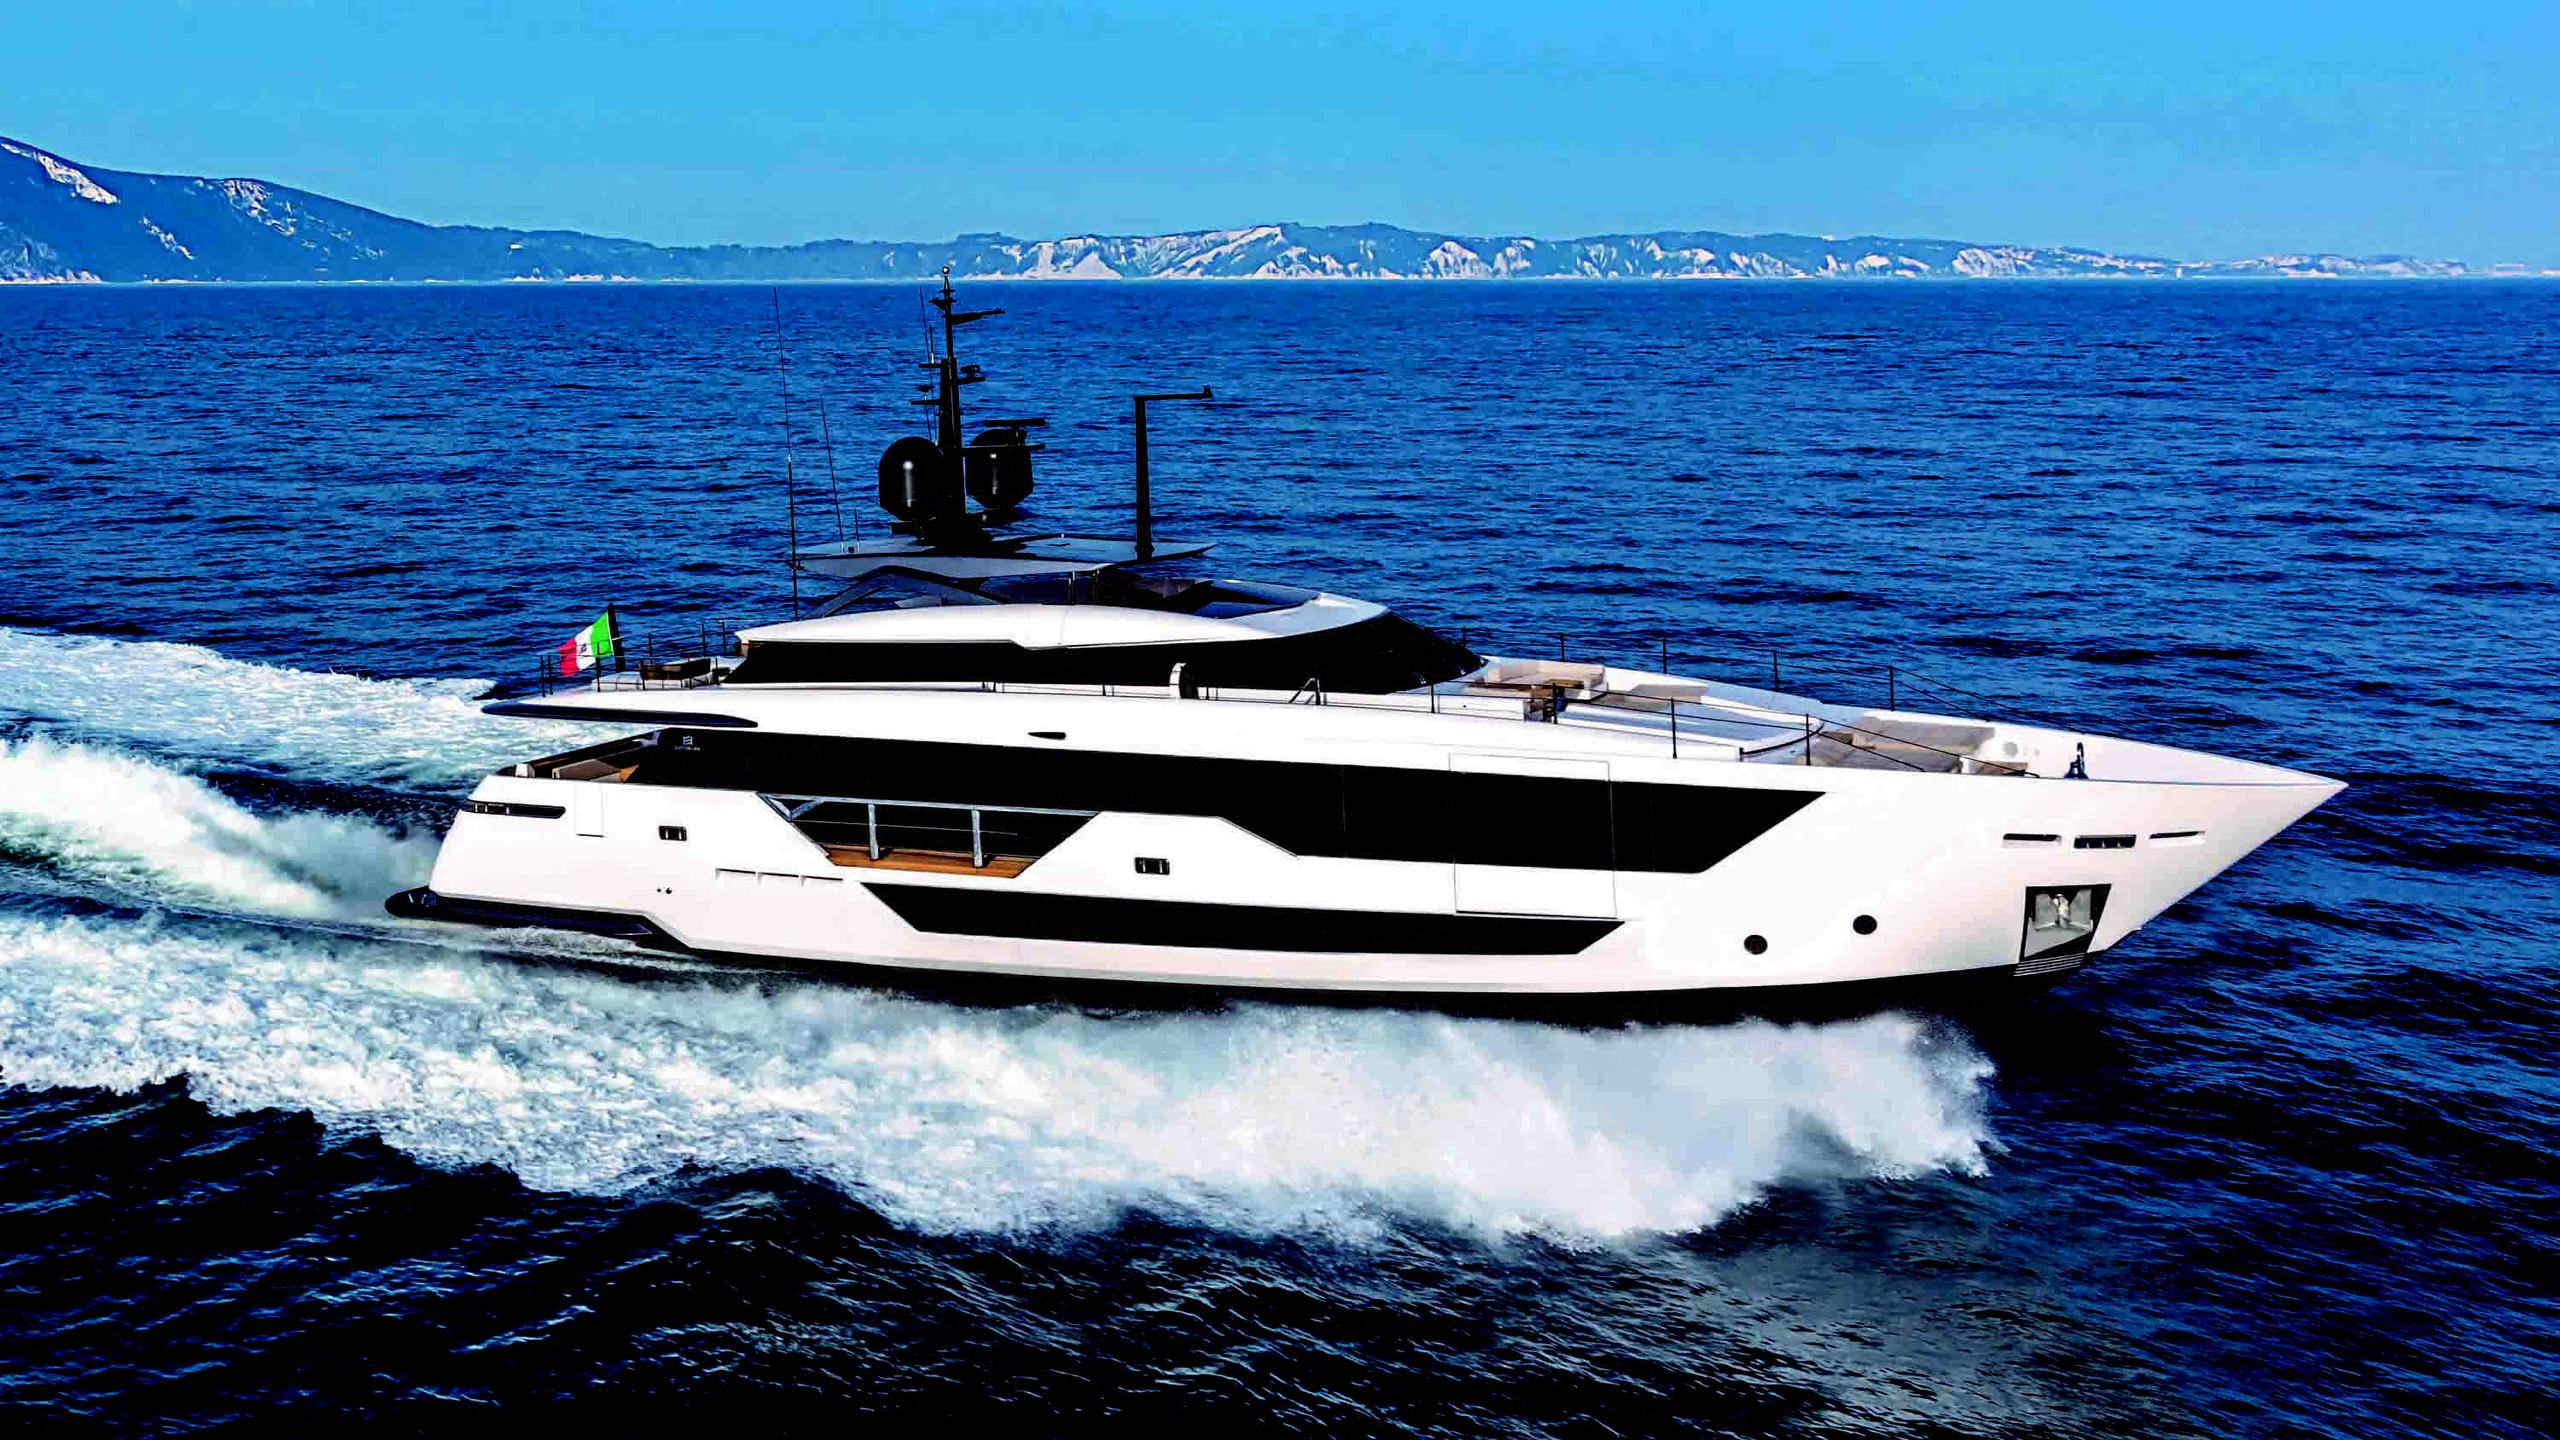 al-mohammady-motoryacht-ferretti-custom-line-106-33m-2019-half-profile-sistership